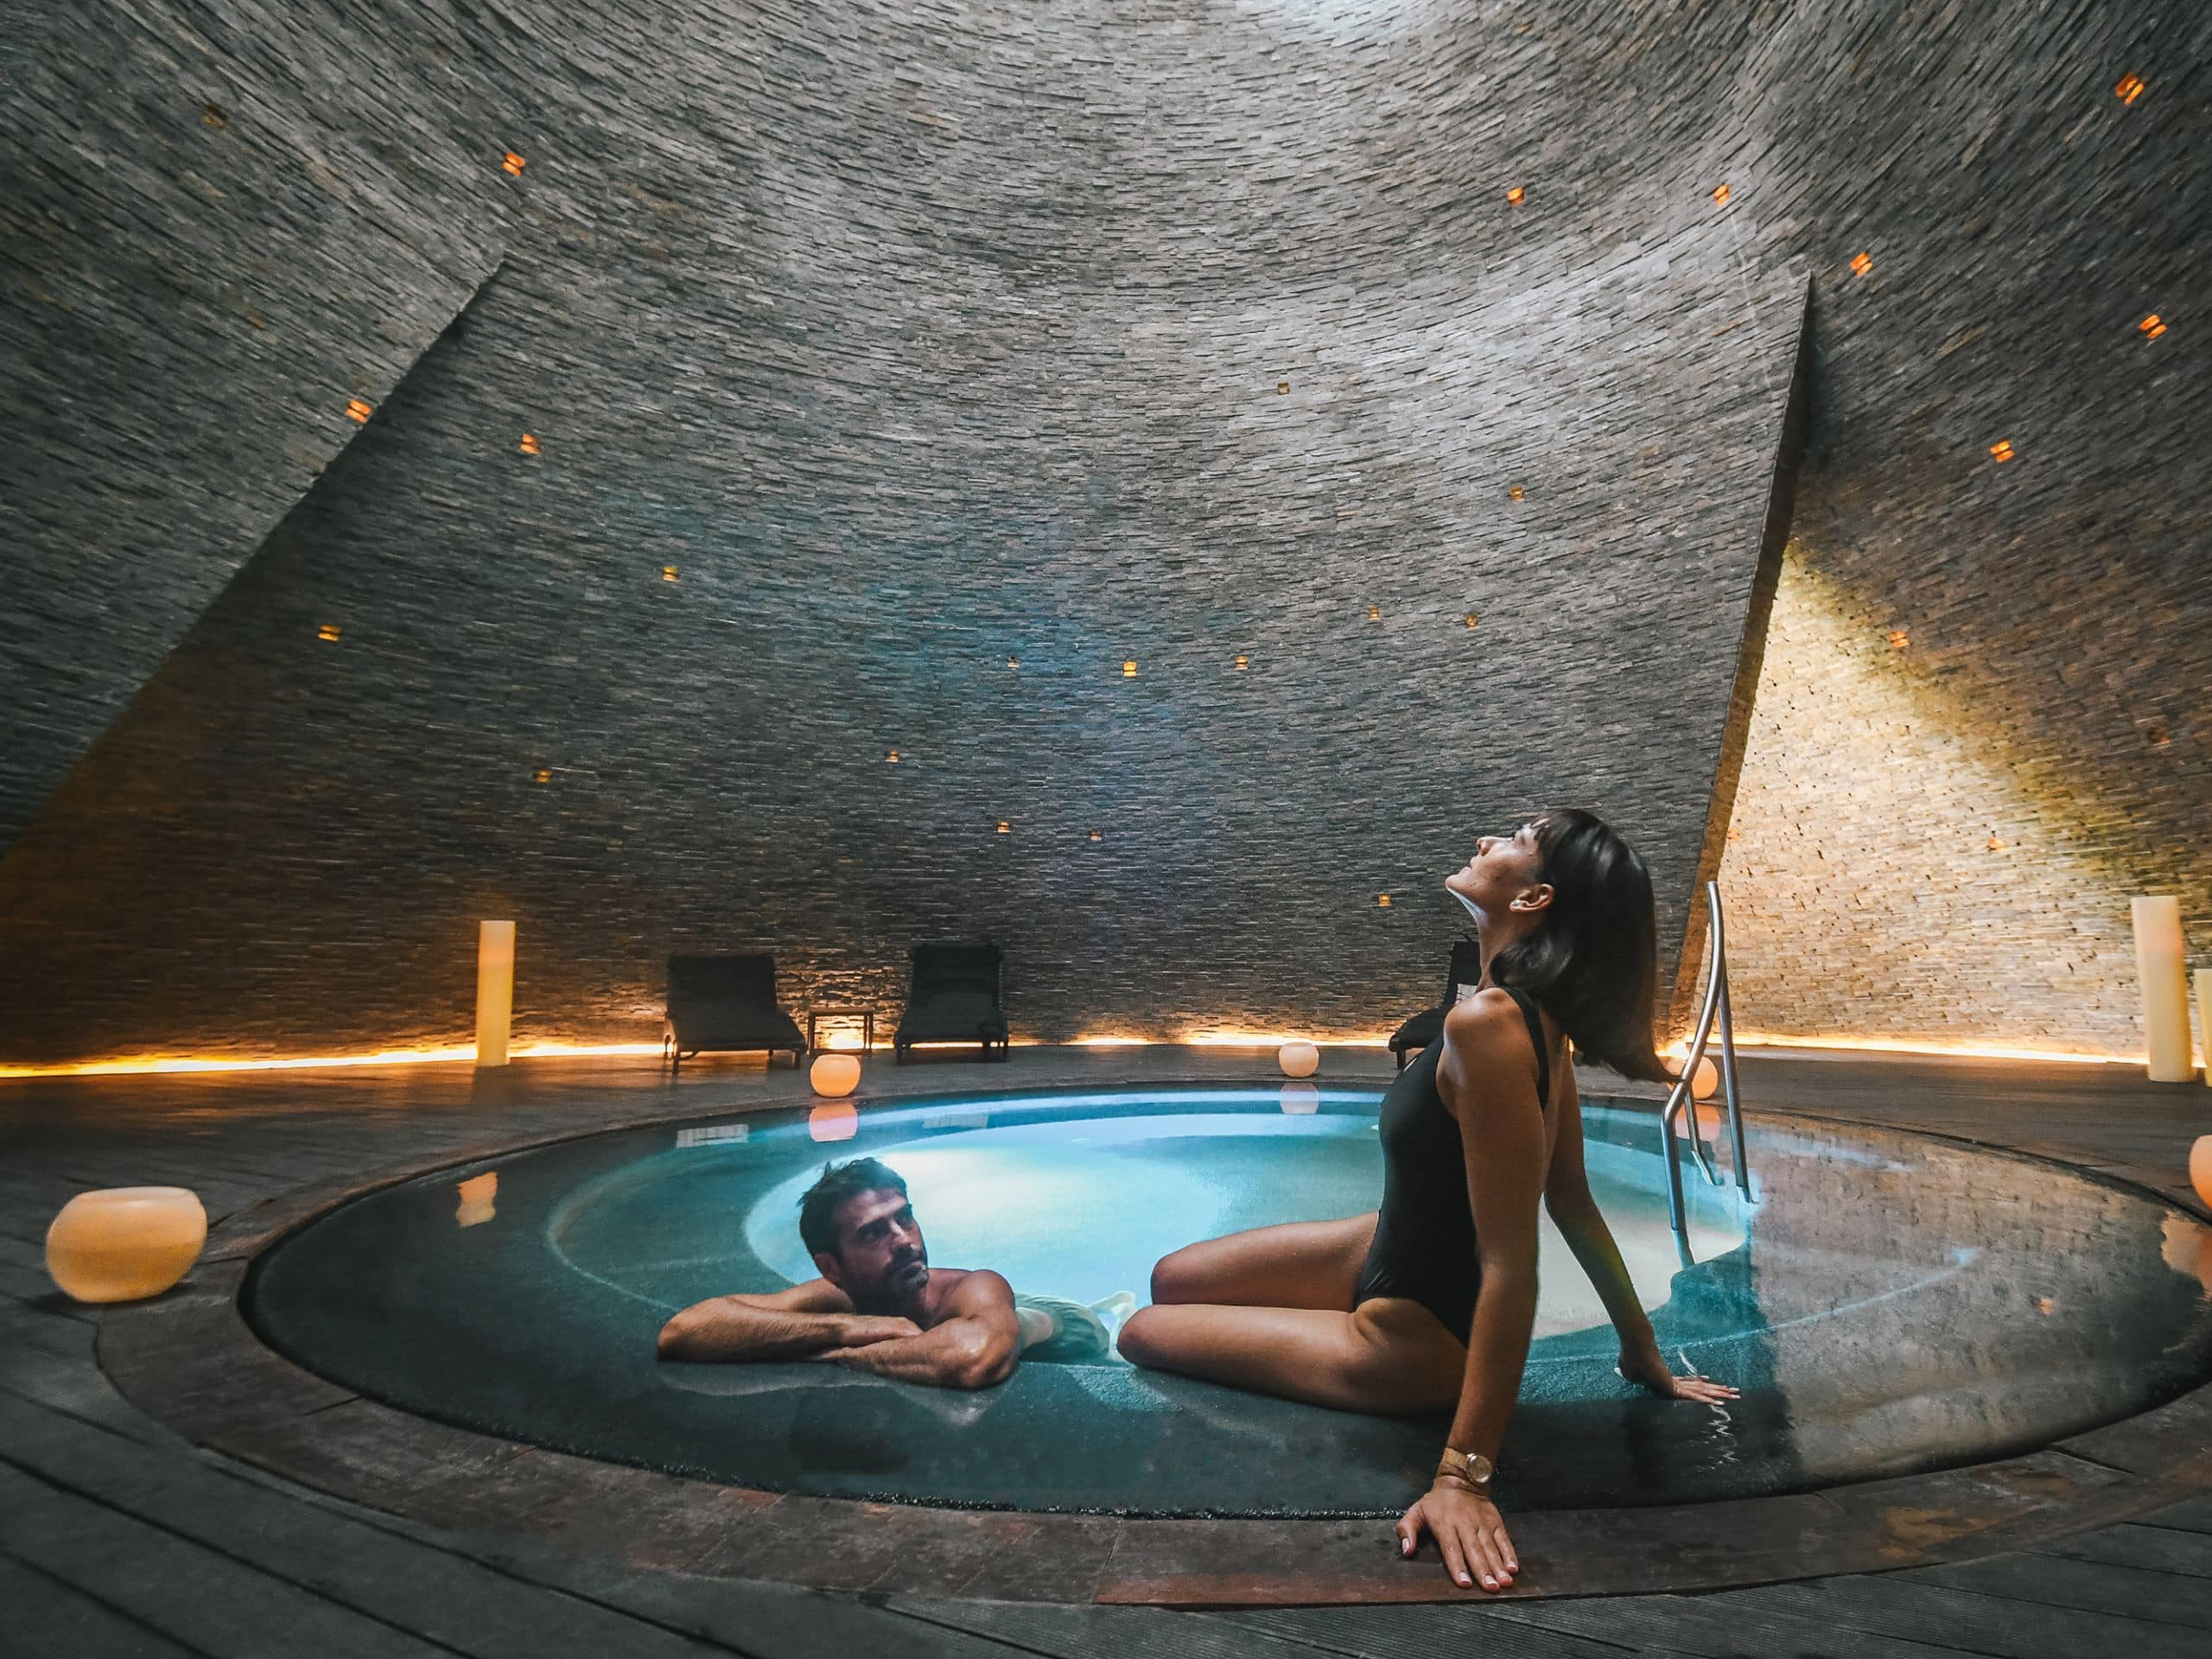 CUNPC_P675 Cenote Spa Relaxation